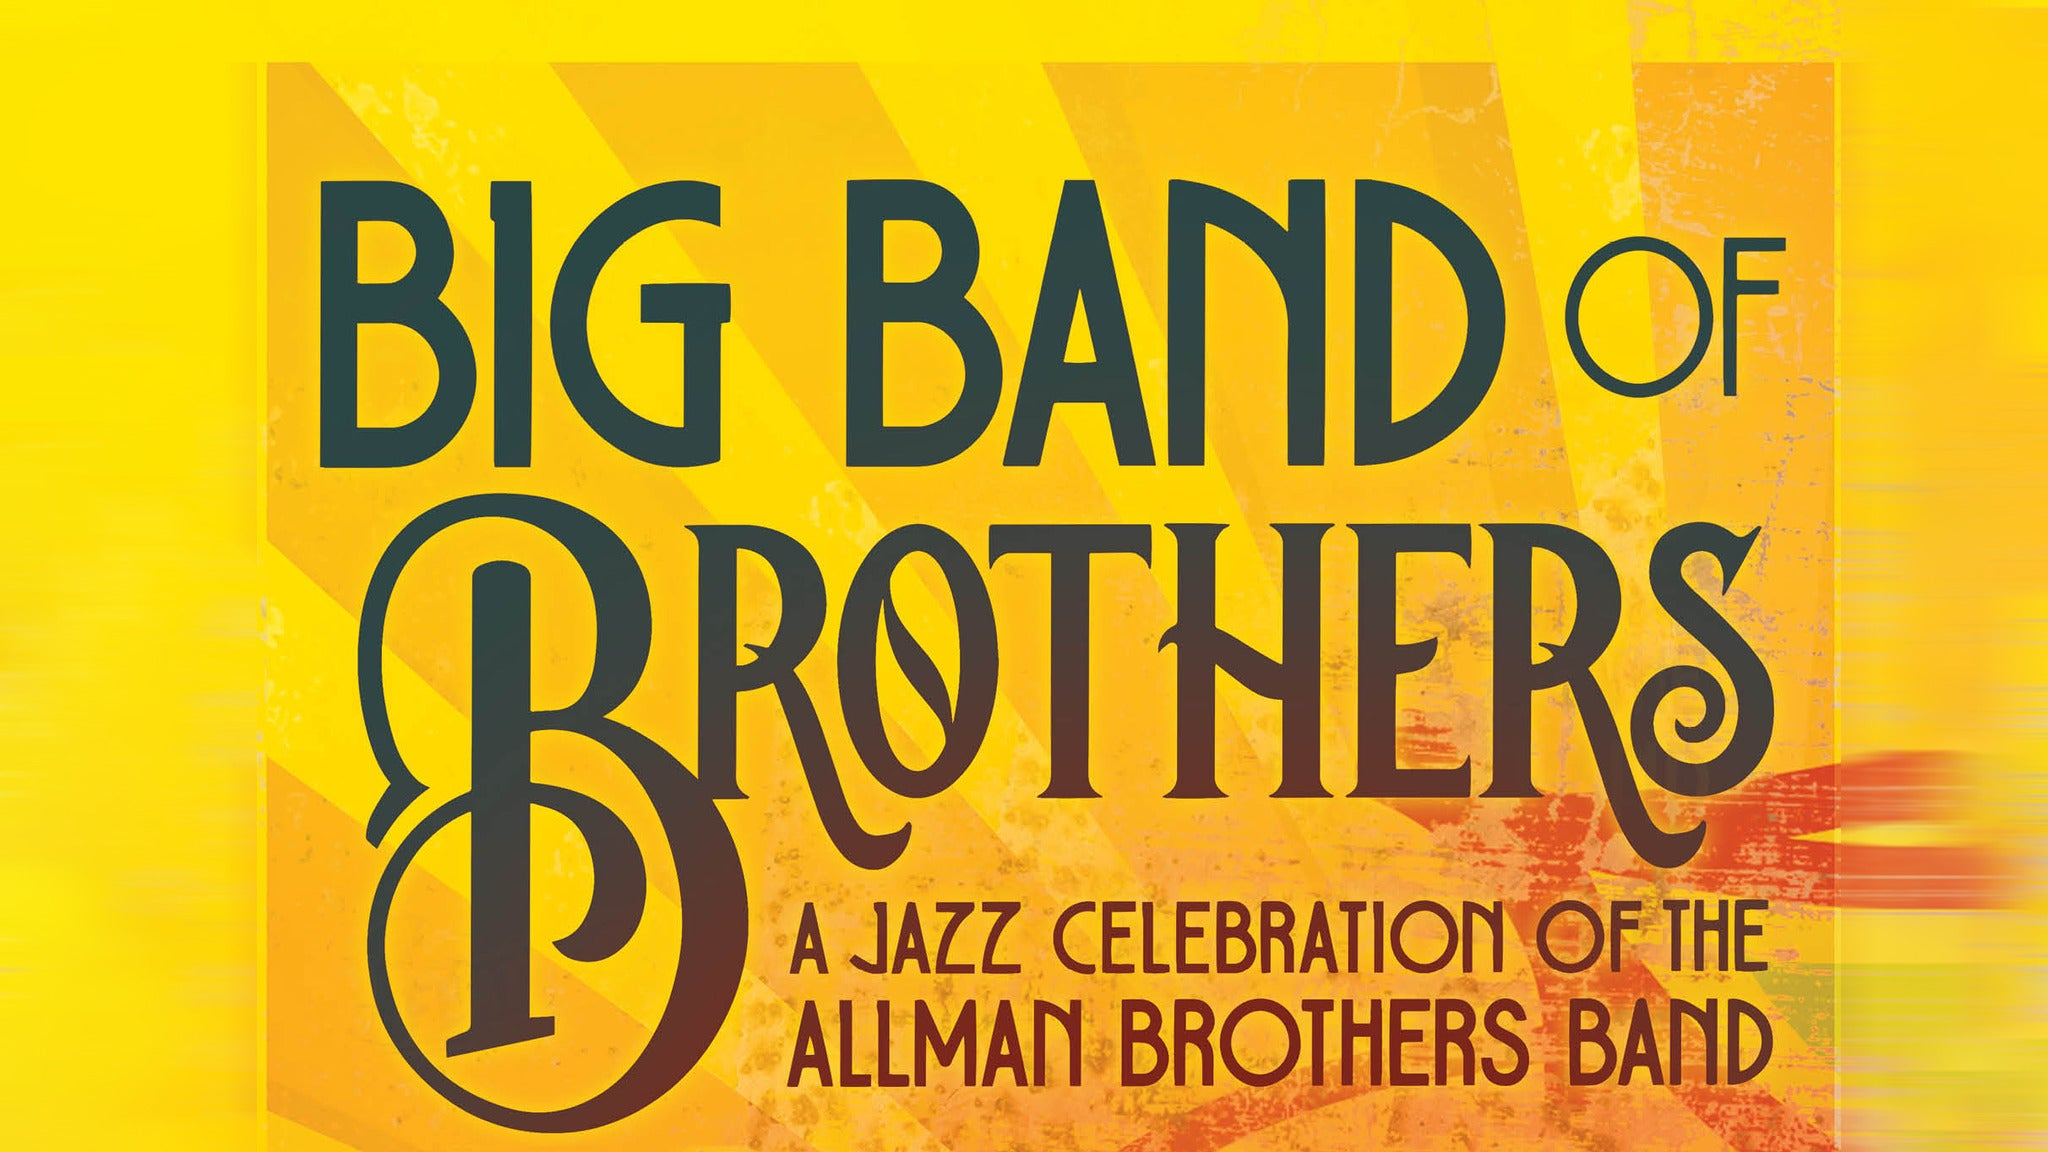 Big Band of Brothers at The Lyric Theatre - Birmingham, AL 35203